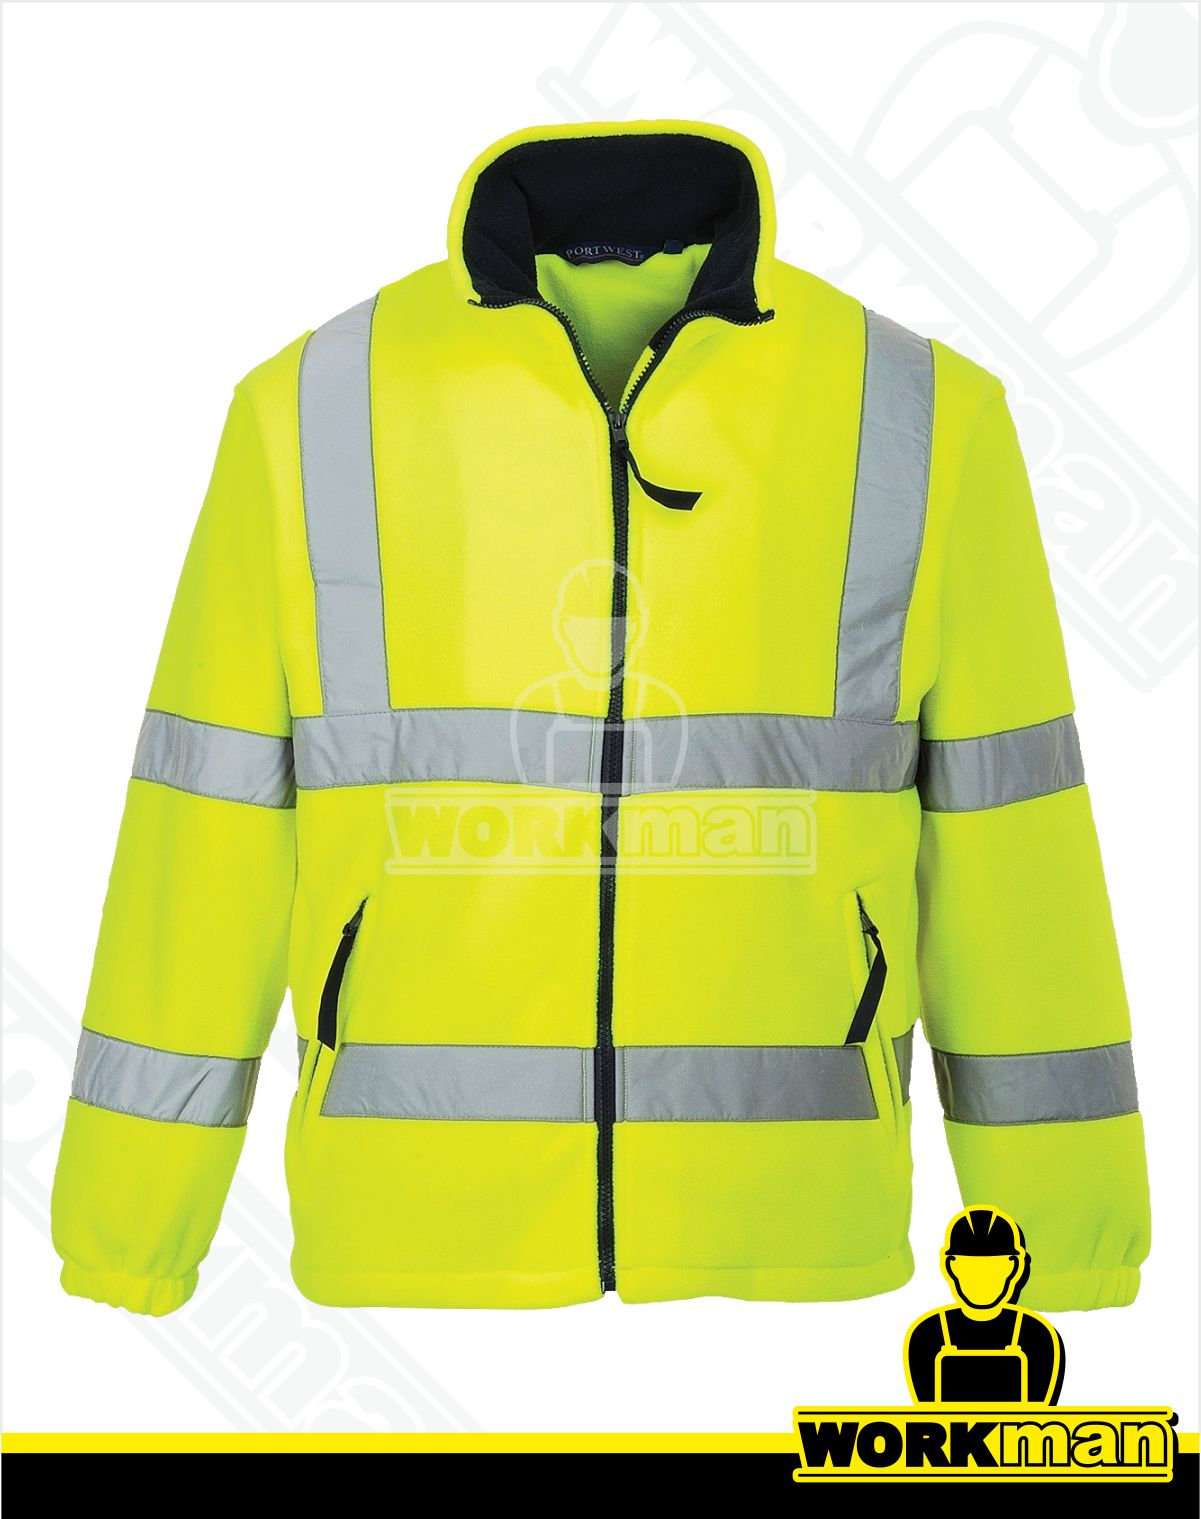 f3195d72c5f4 Reflexná fleece bunda F300 Portwest žltá Pracovné odevy WORKMAN